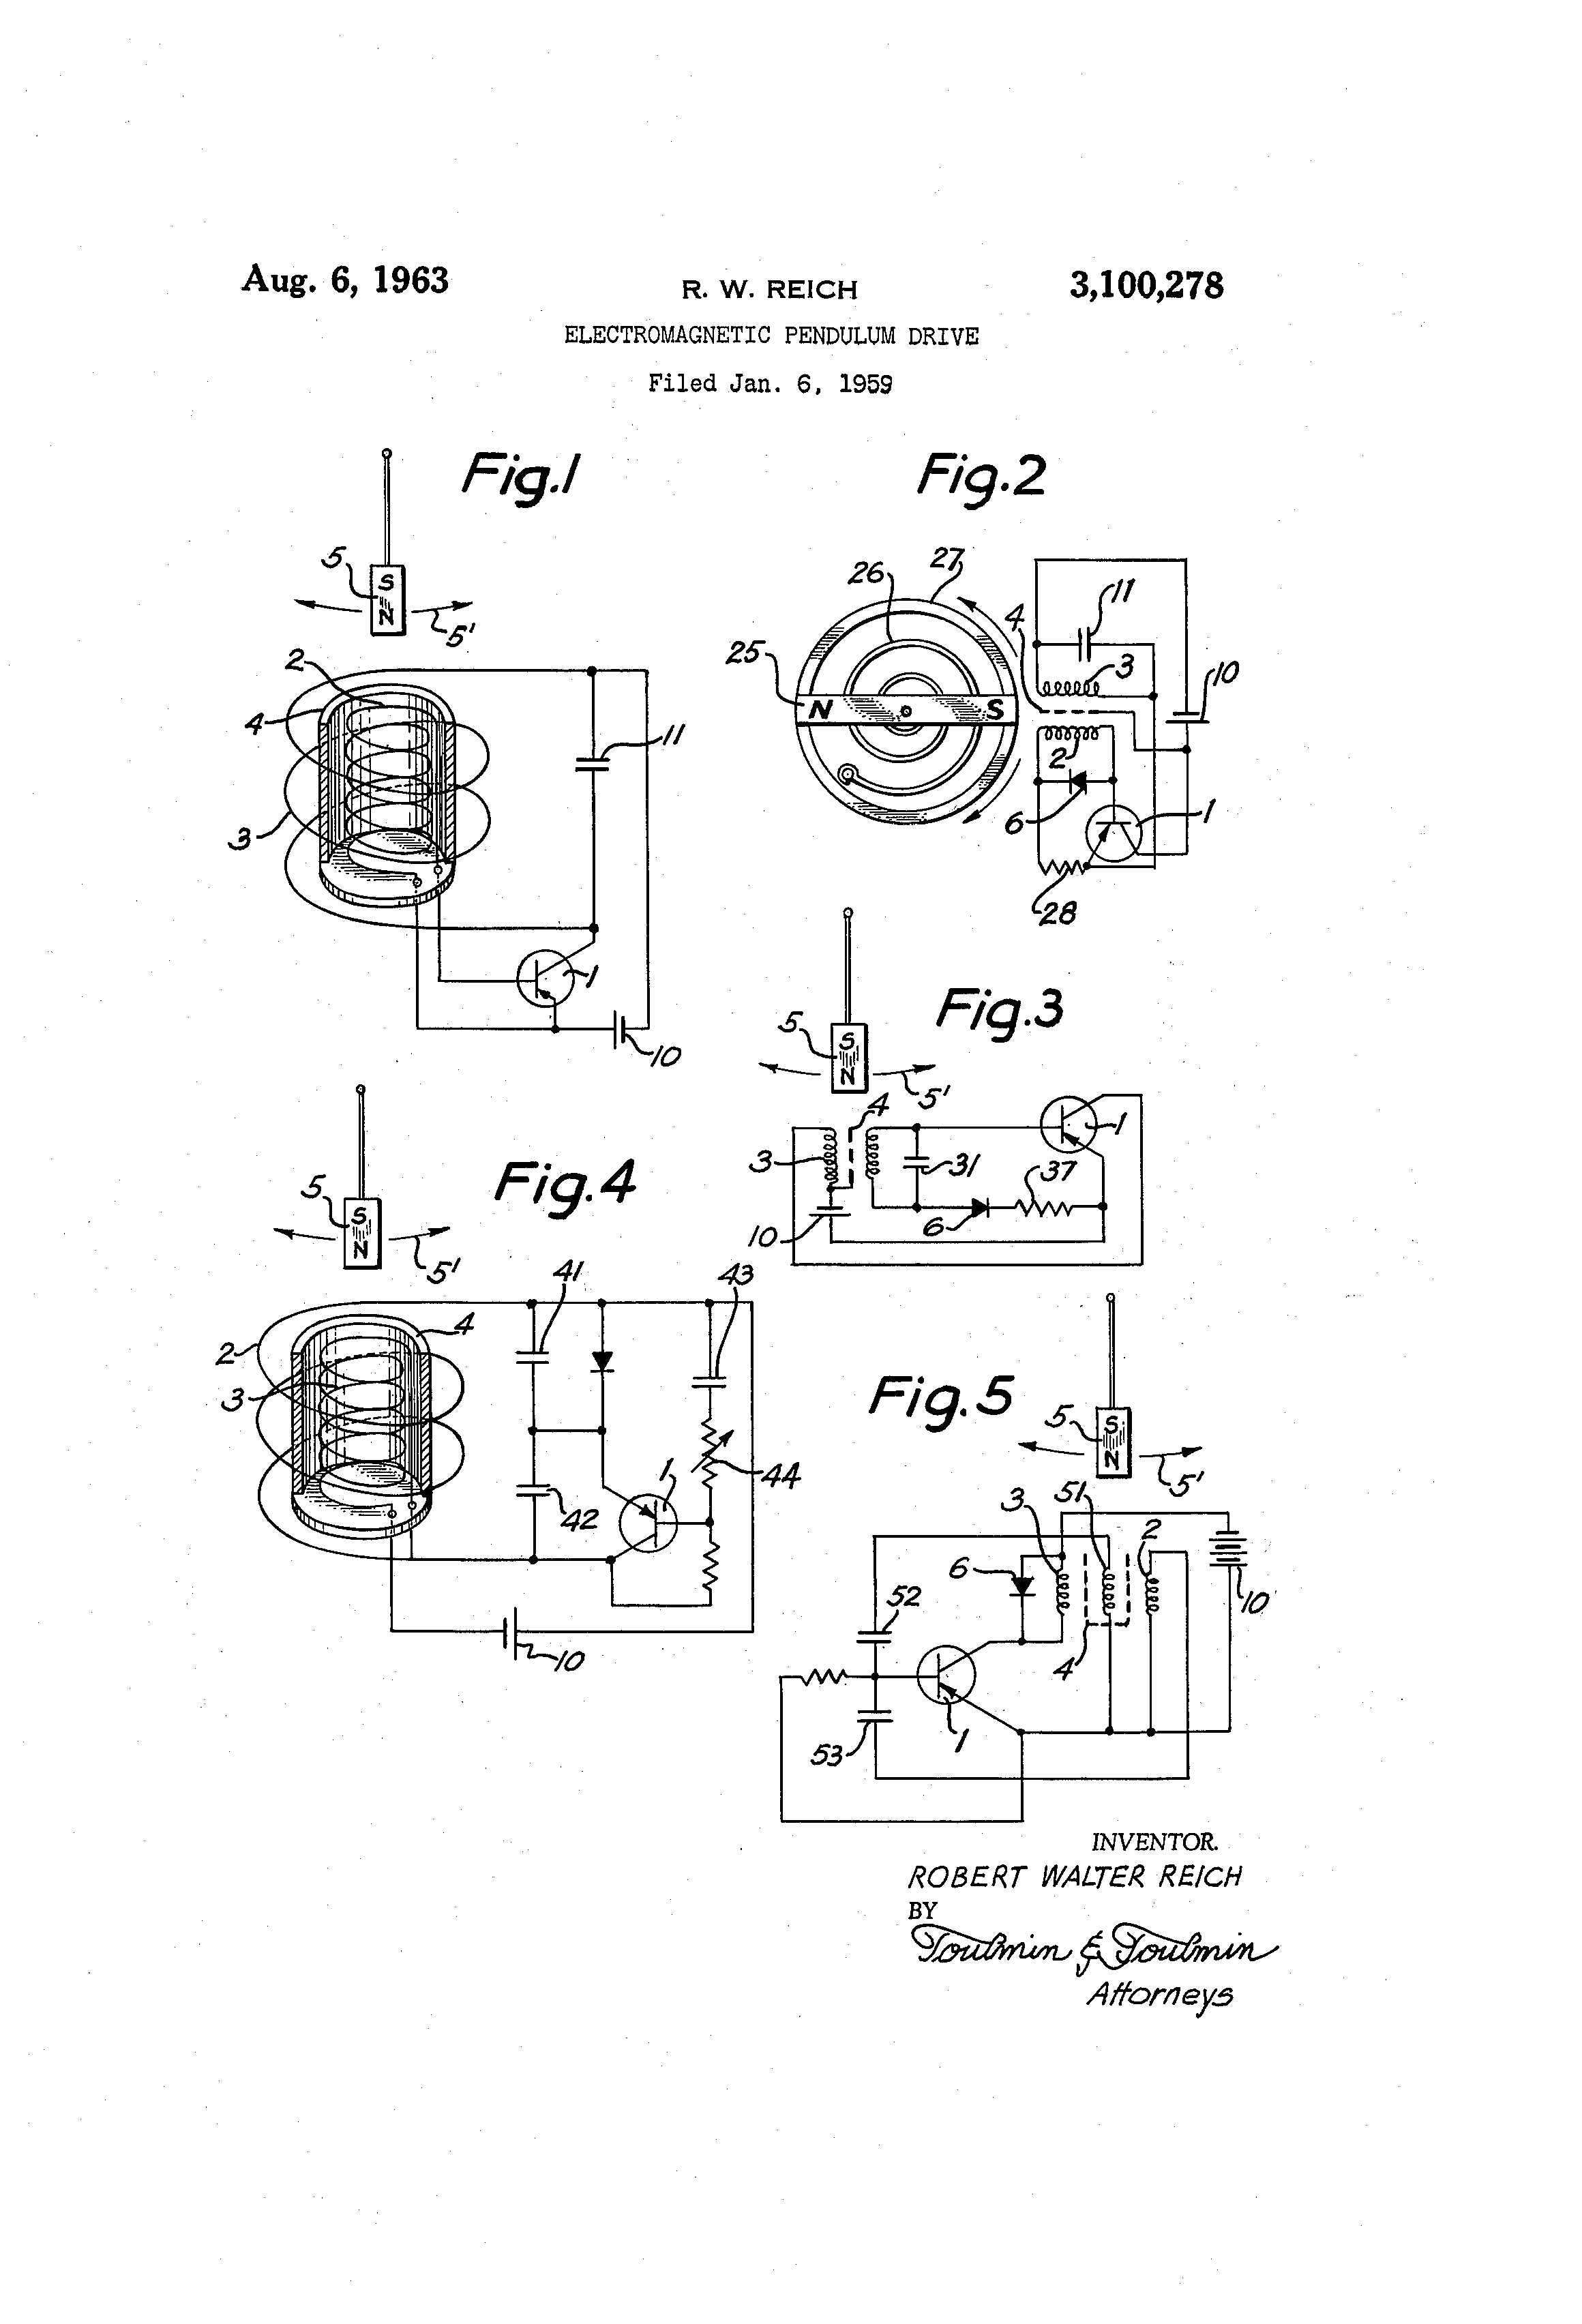 patent us3100278 - electromagnetic pendulum drive